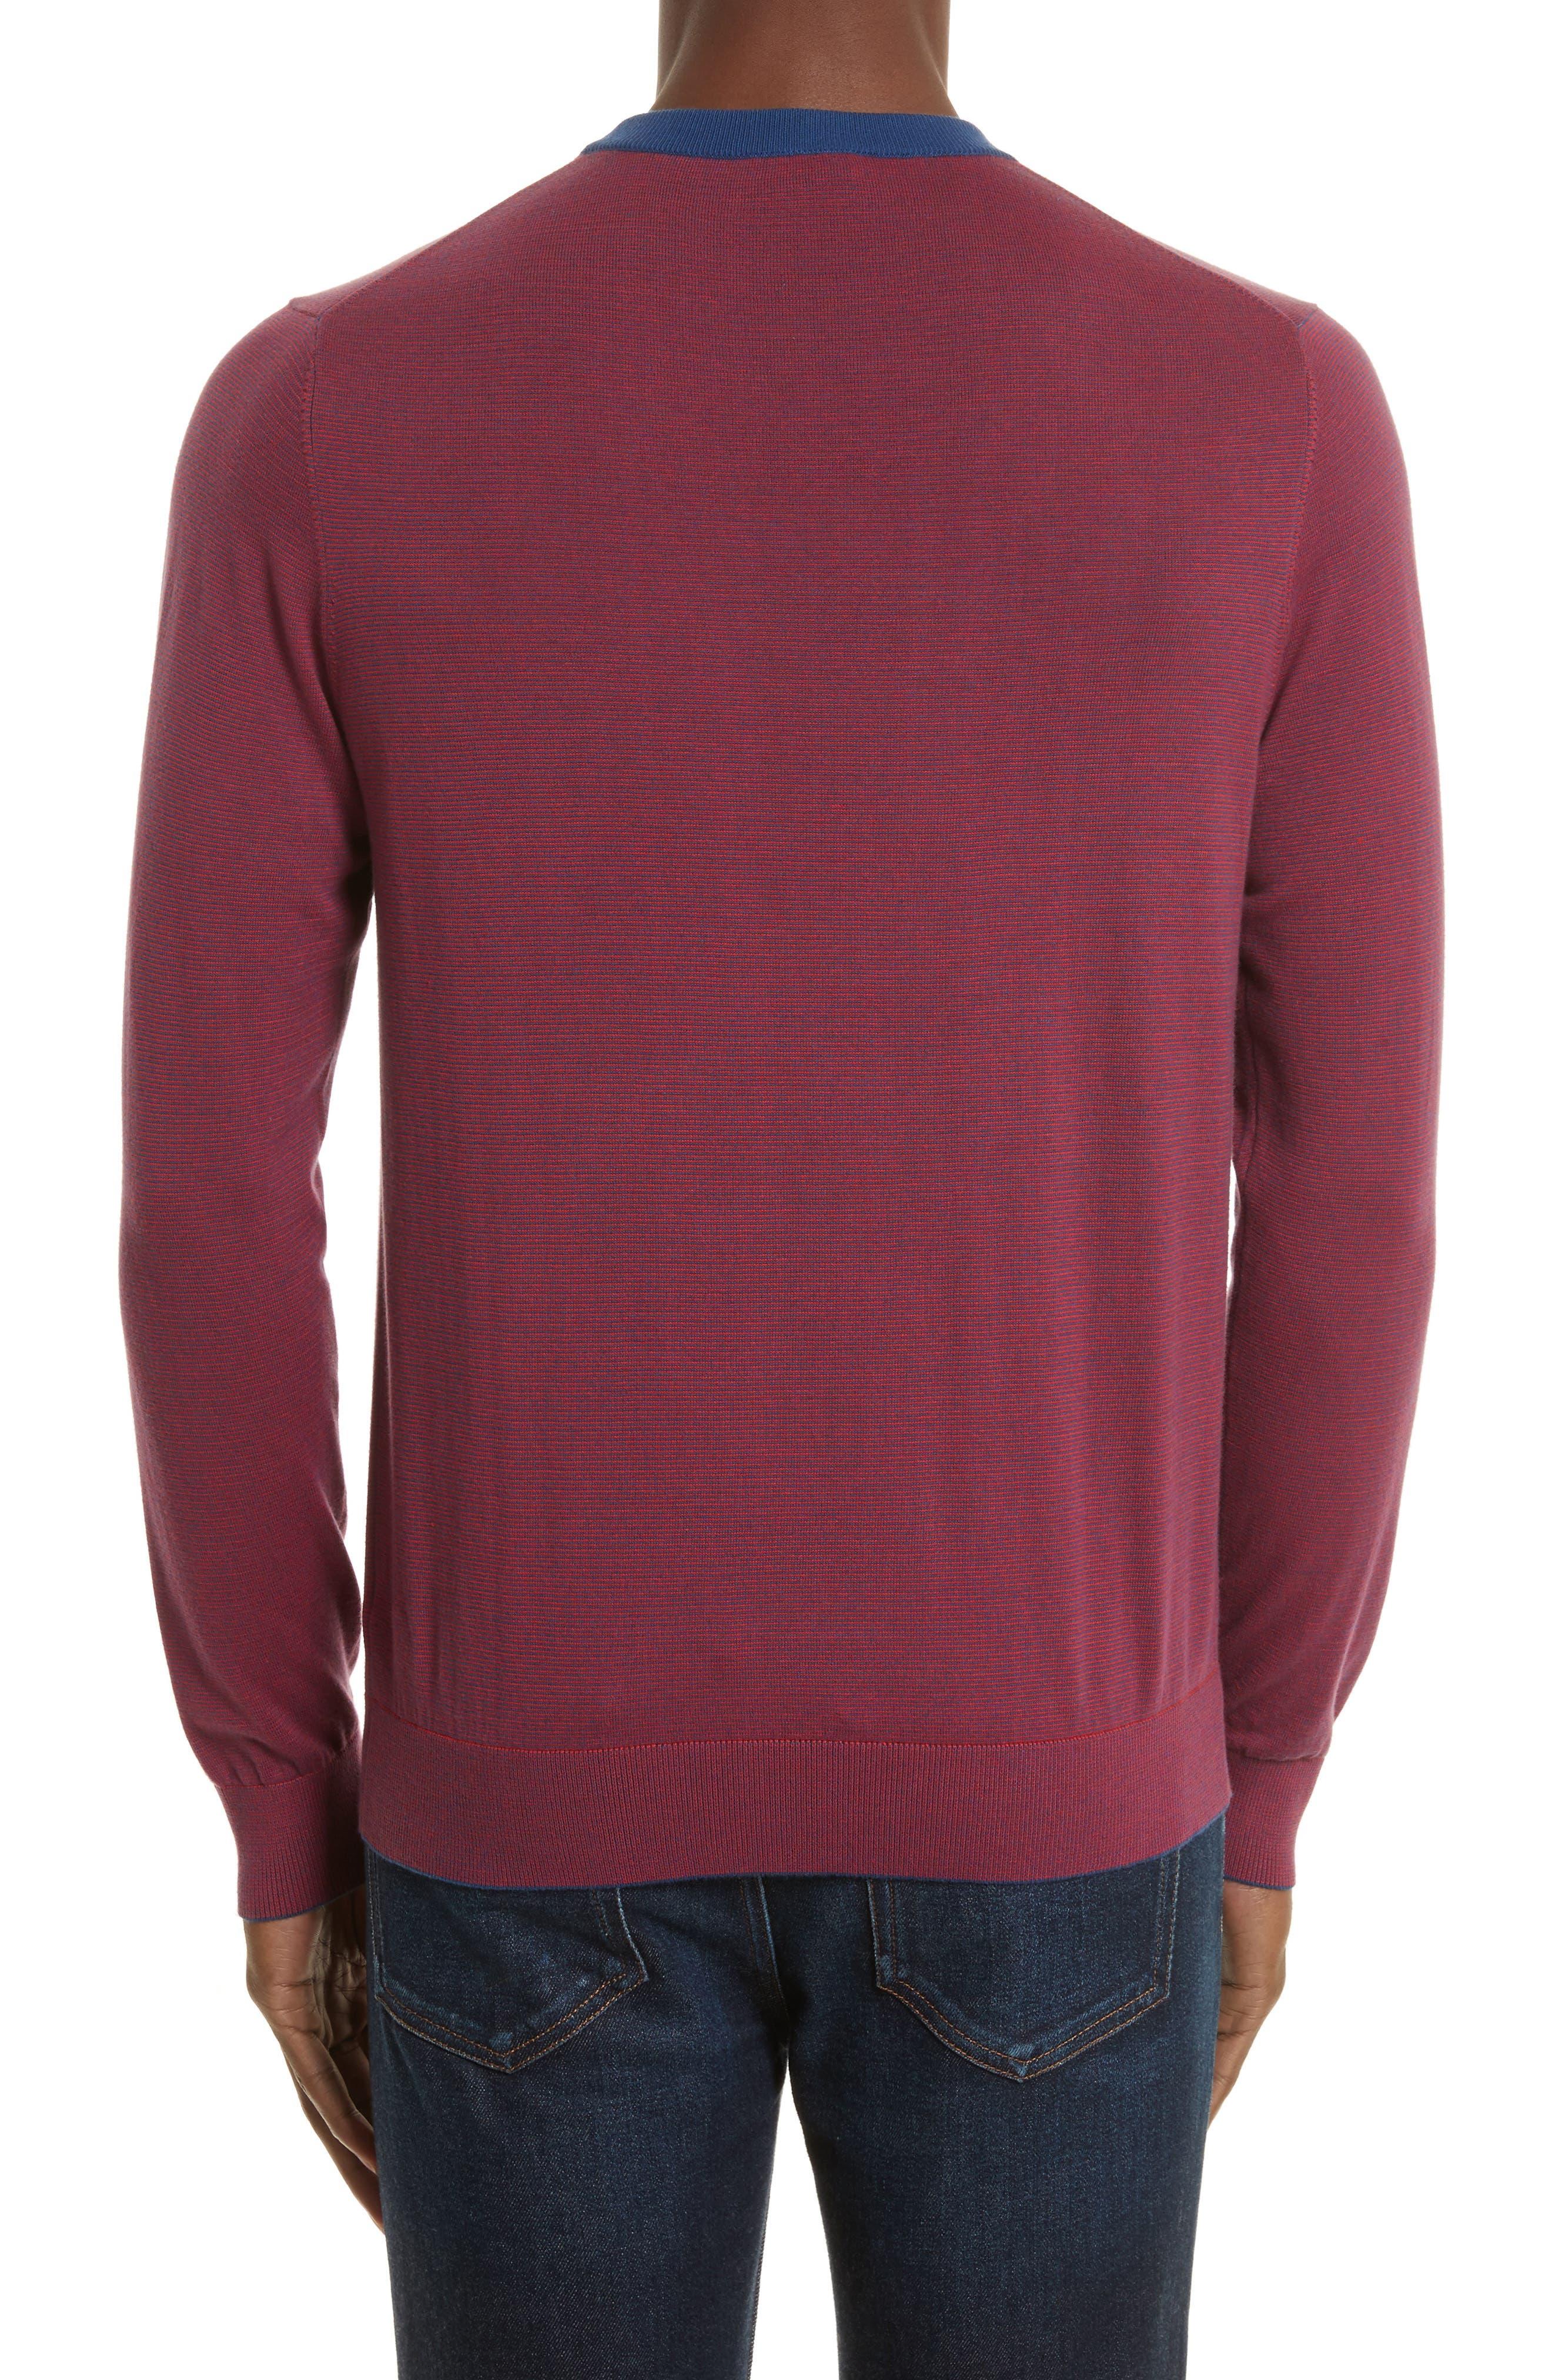 Ministripe Crewneck Sweater,                             Alternate thumbnail 2, color,                             415